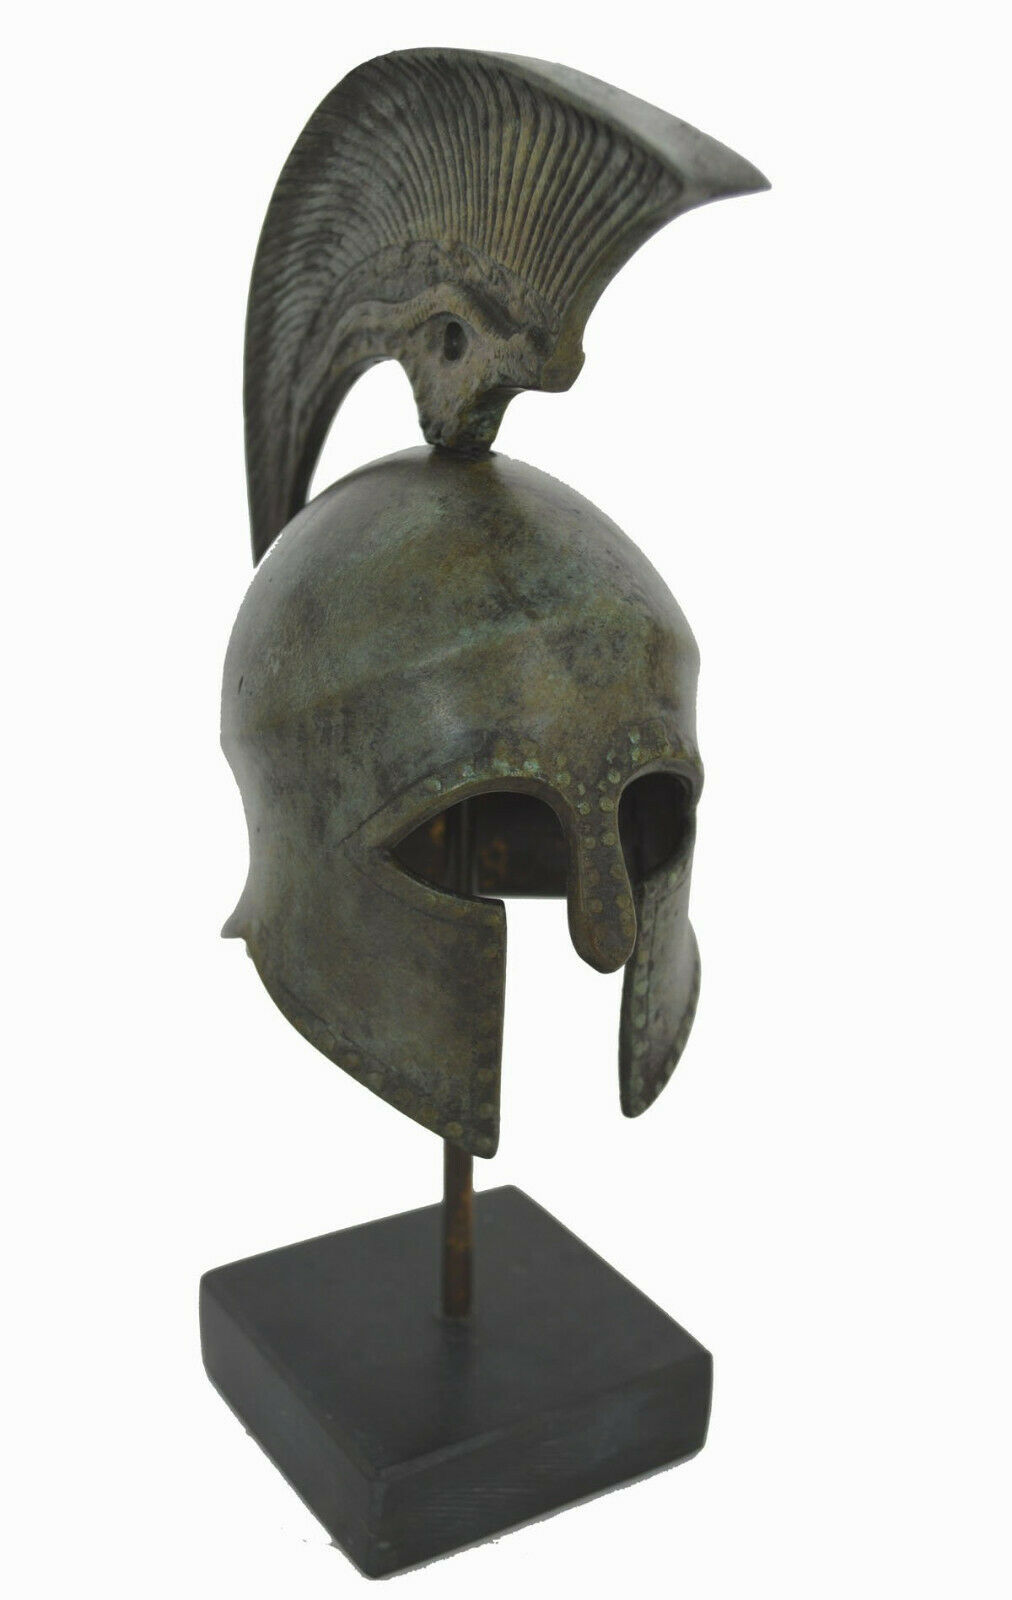 Casco De Bronce Mármol basado en griego antiguo artefacto de reproducción